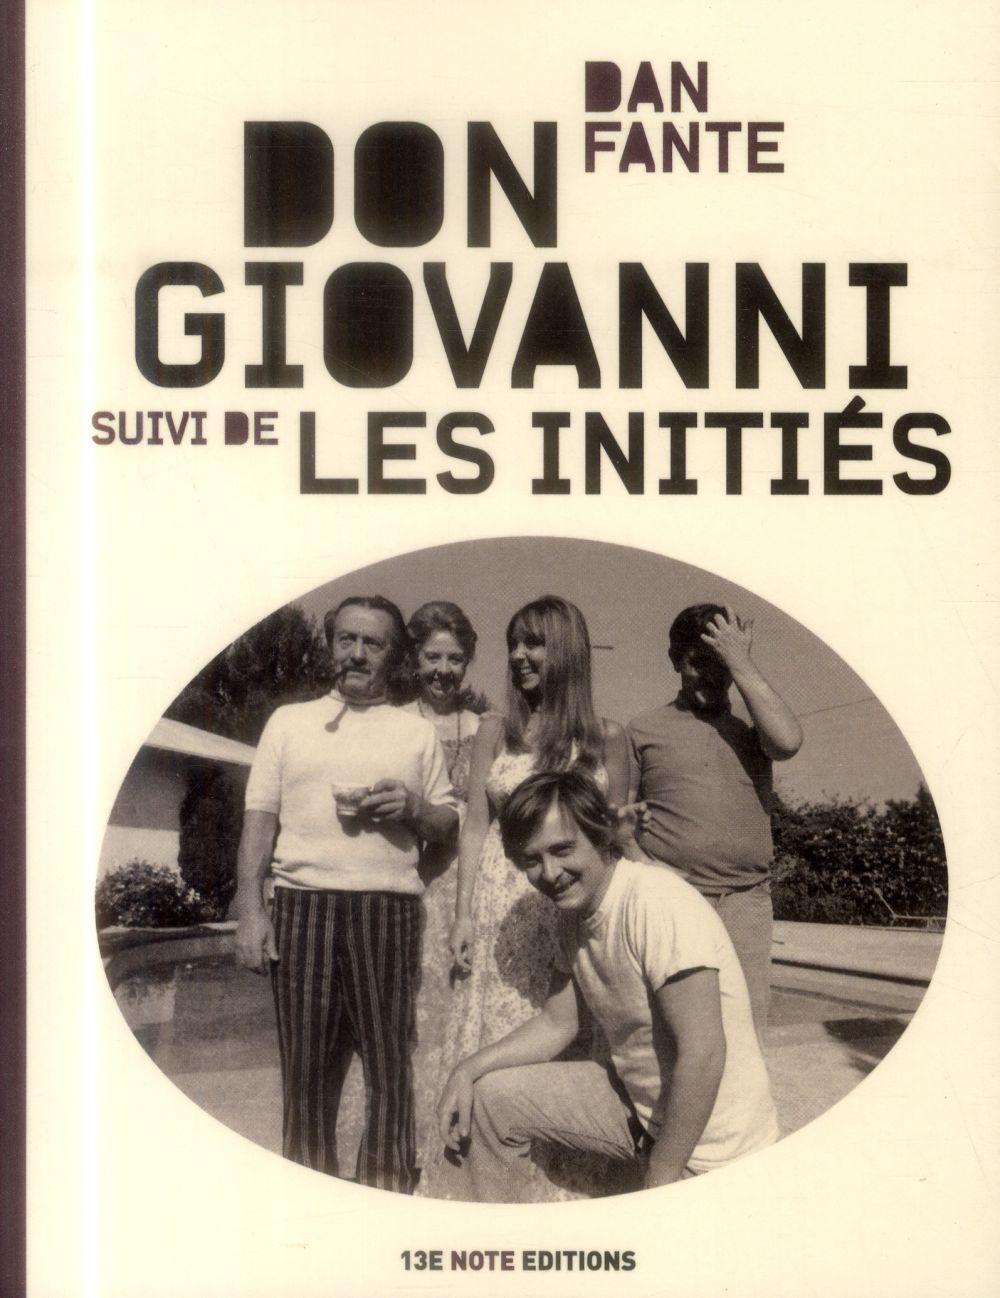 Don Giovanni ; les initiés